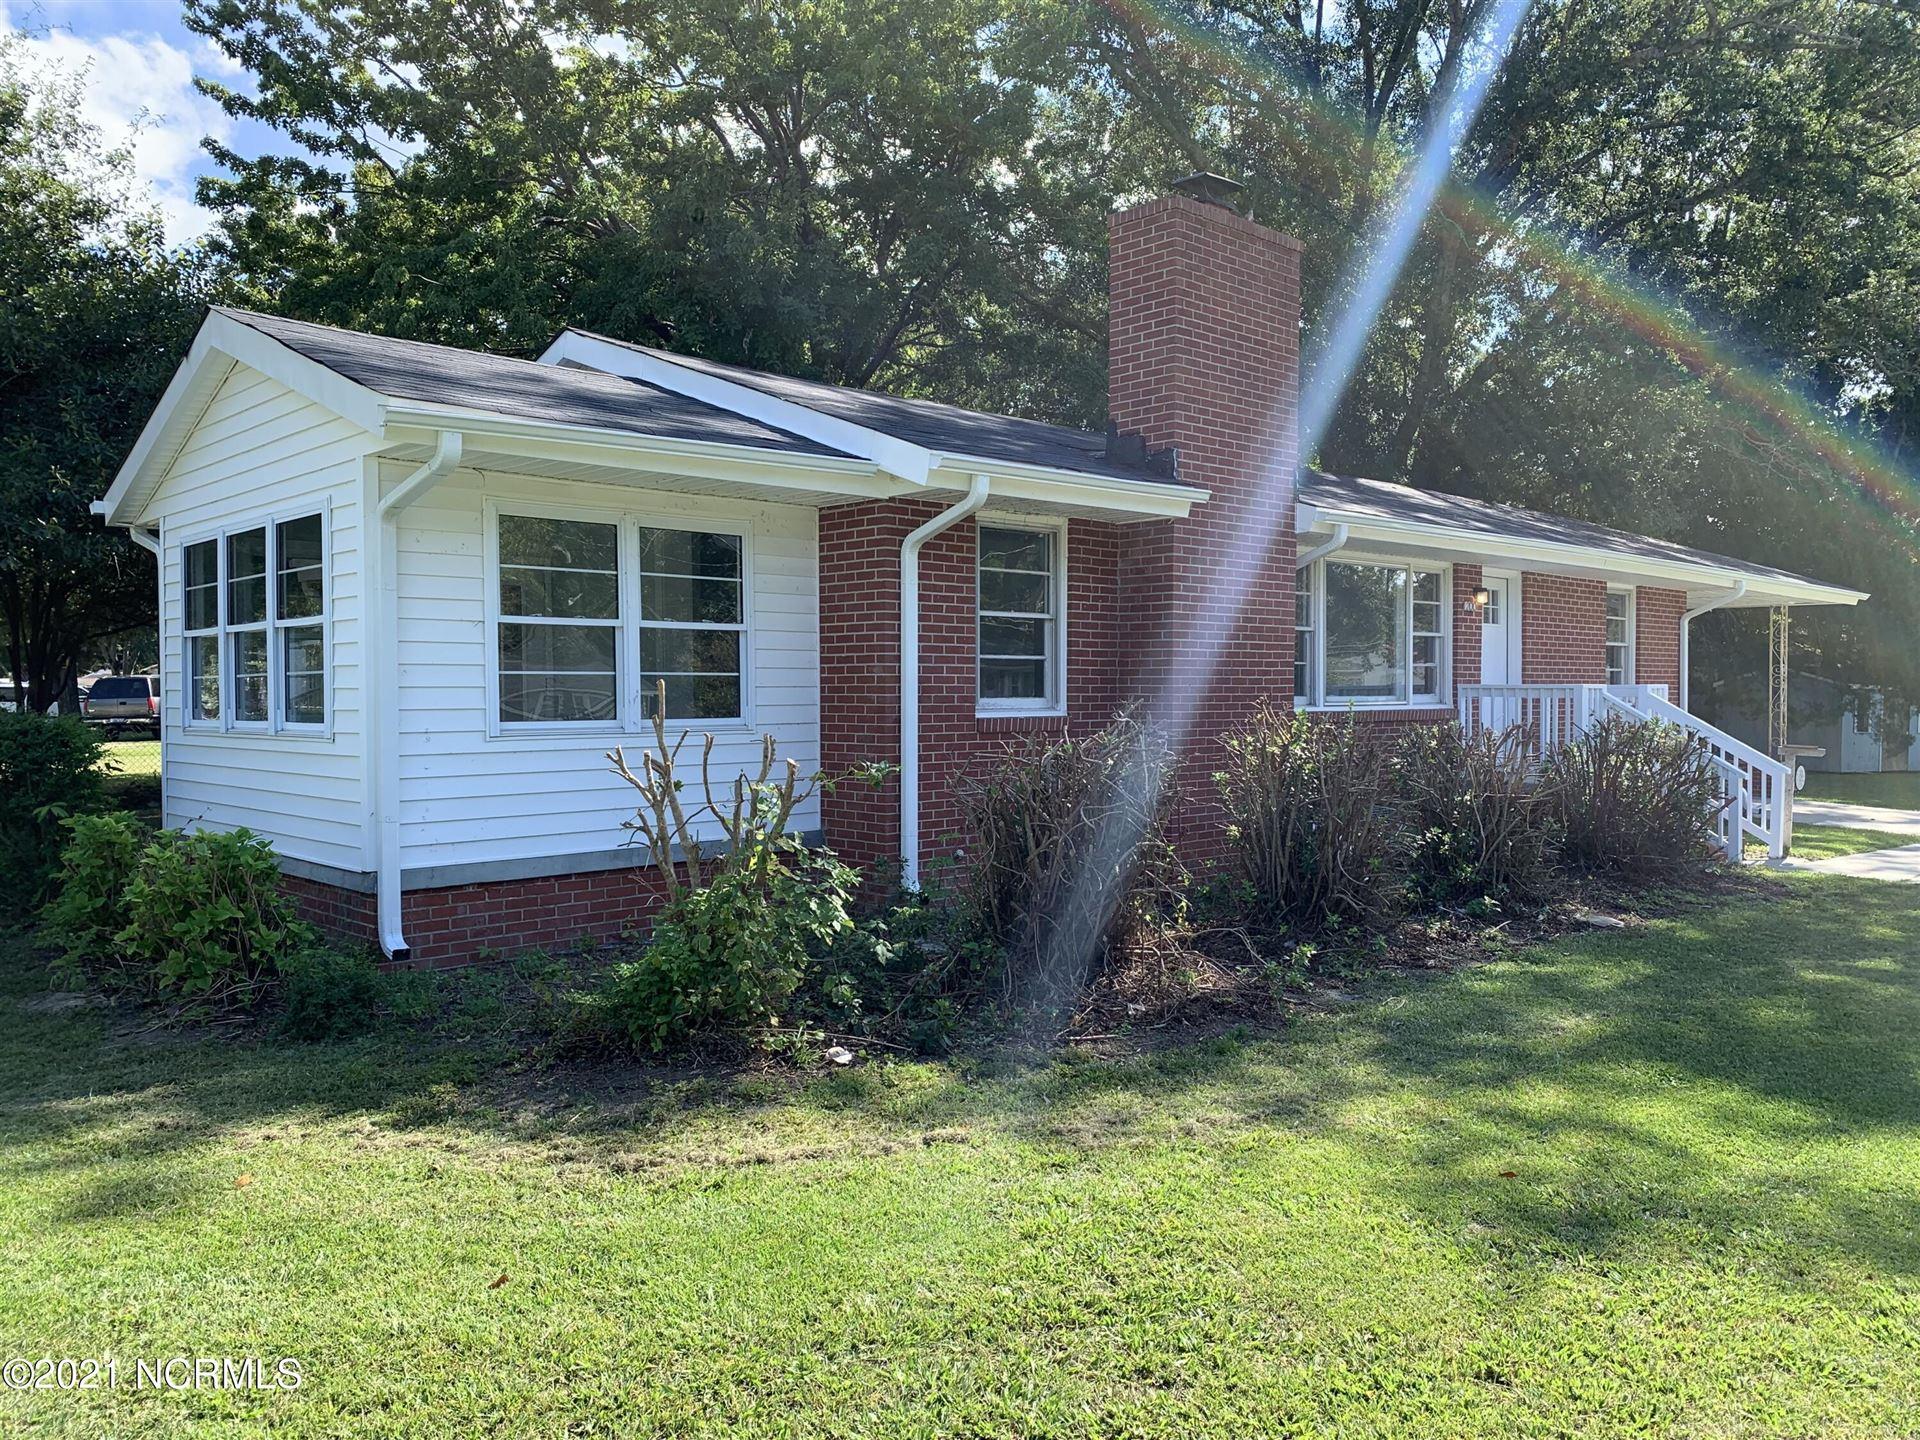 Photo of 200 Dewitt Street, Jacksonville, NC 28540 (MLS # 100290614)